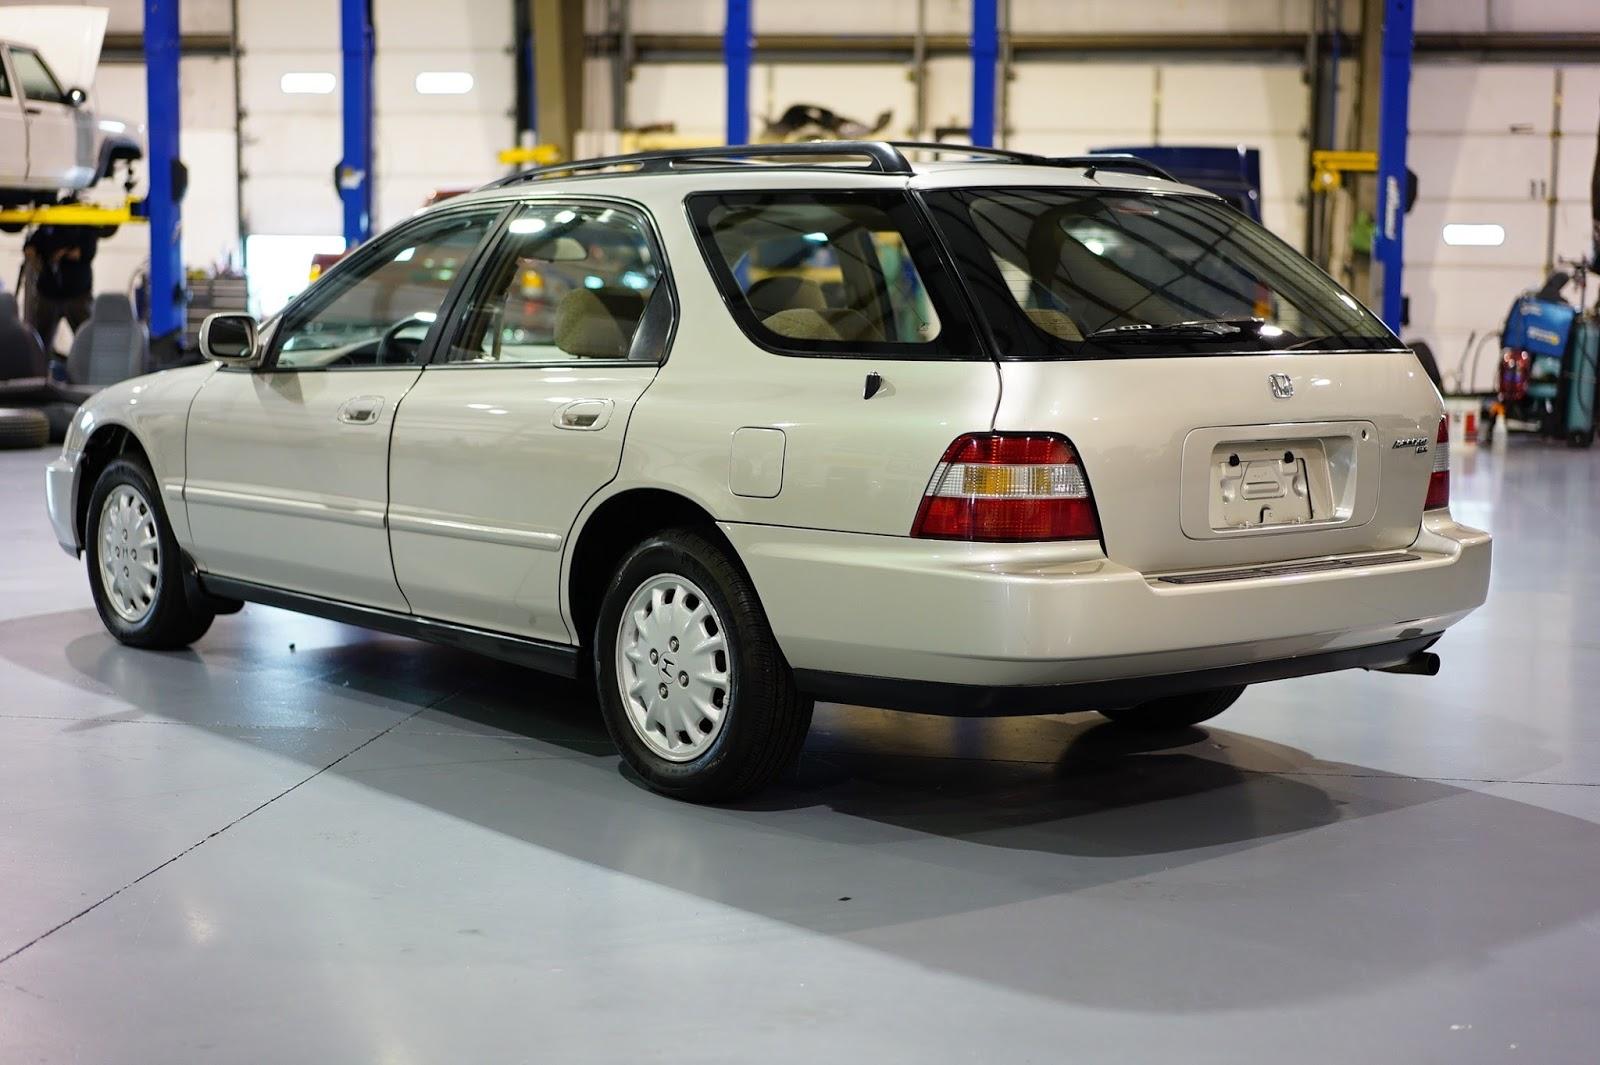 1996 Honda Civic Wiring Diagram On Wiring Diagram Honda Accord 2003